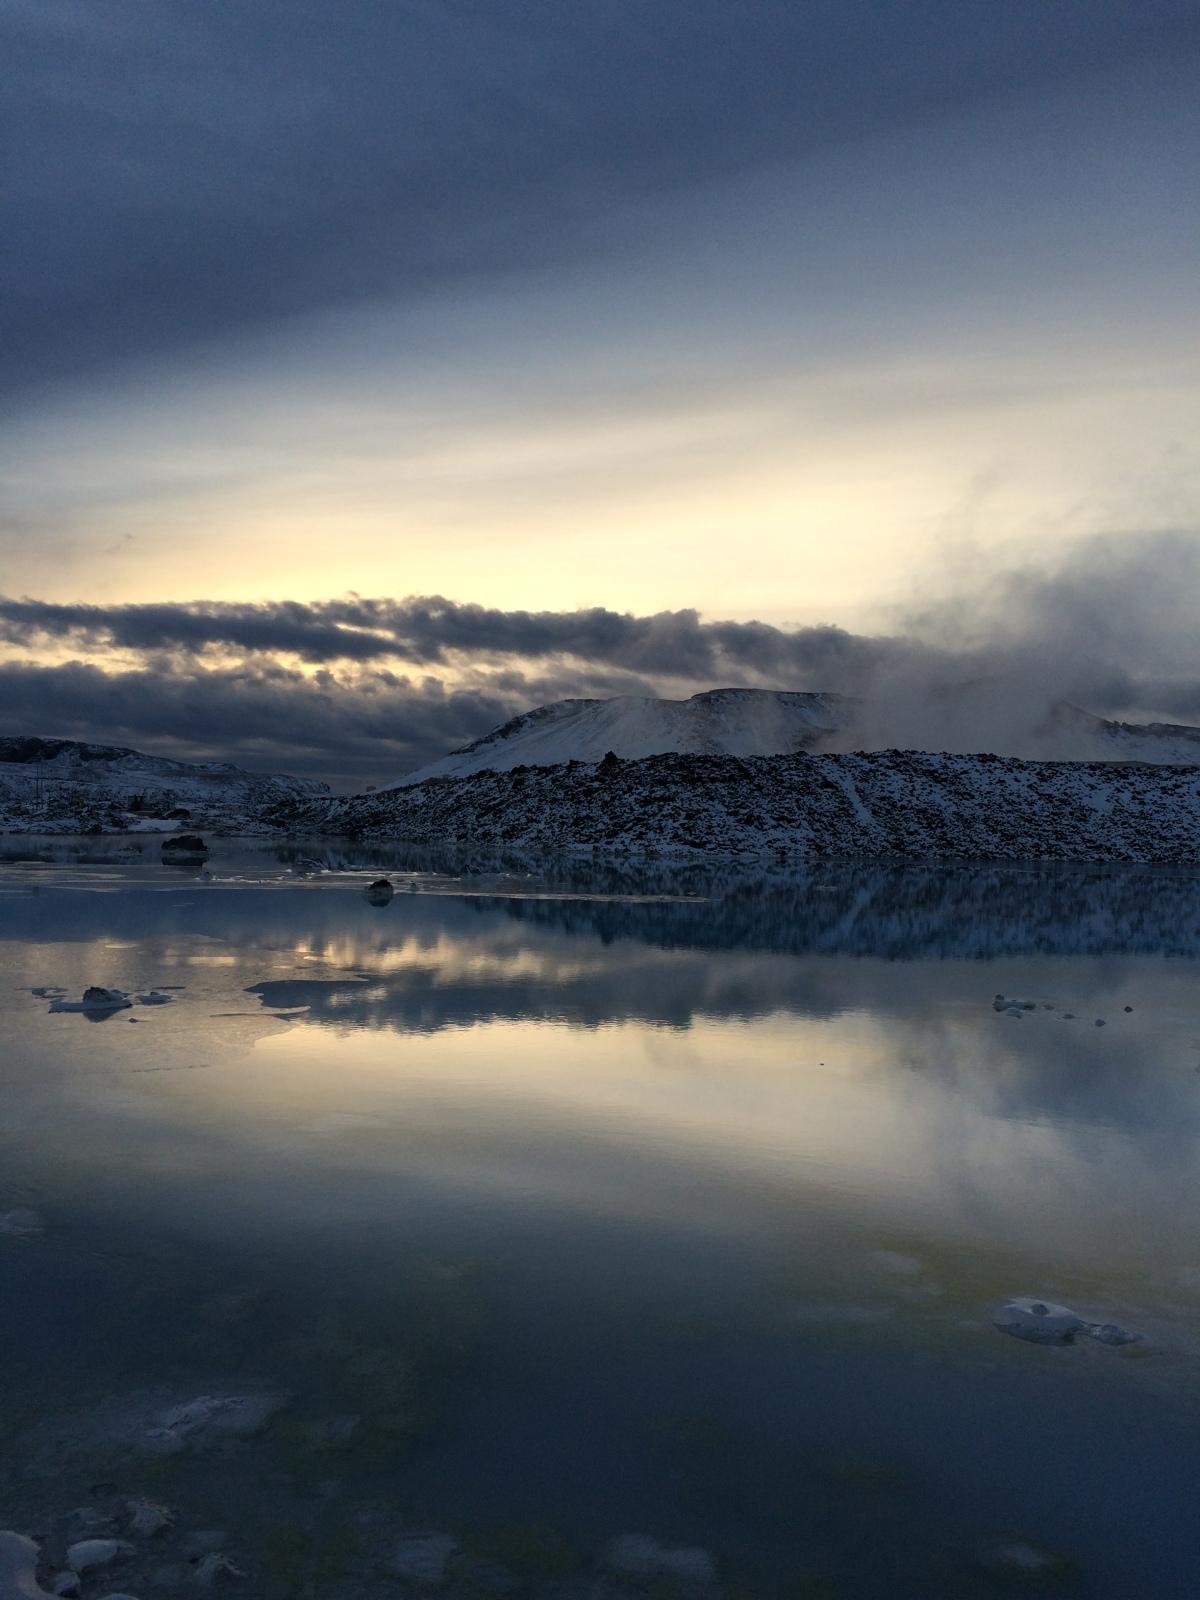 Ég elska Ísland- An Icelandicessay